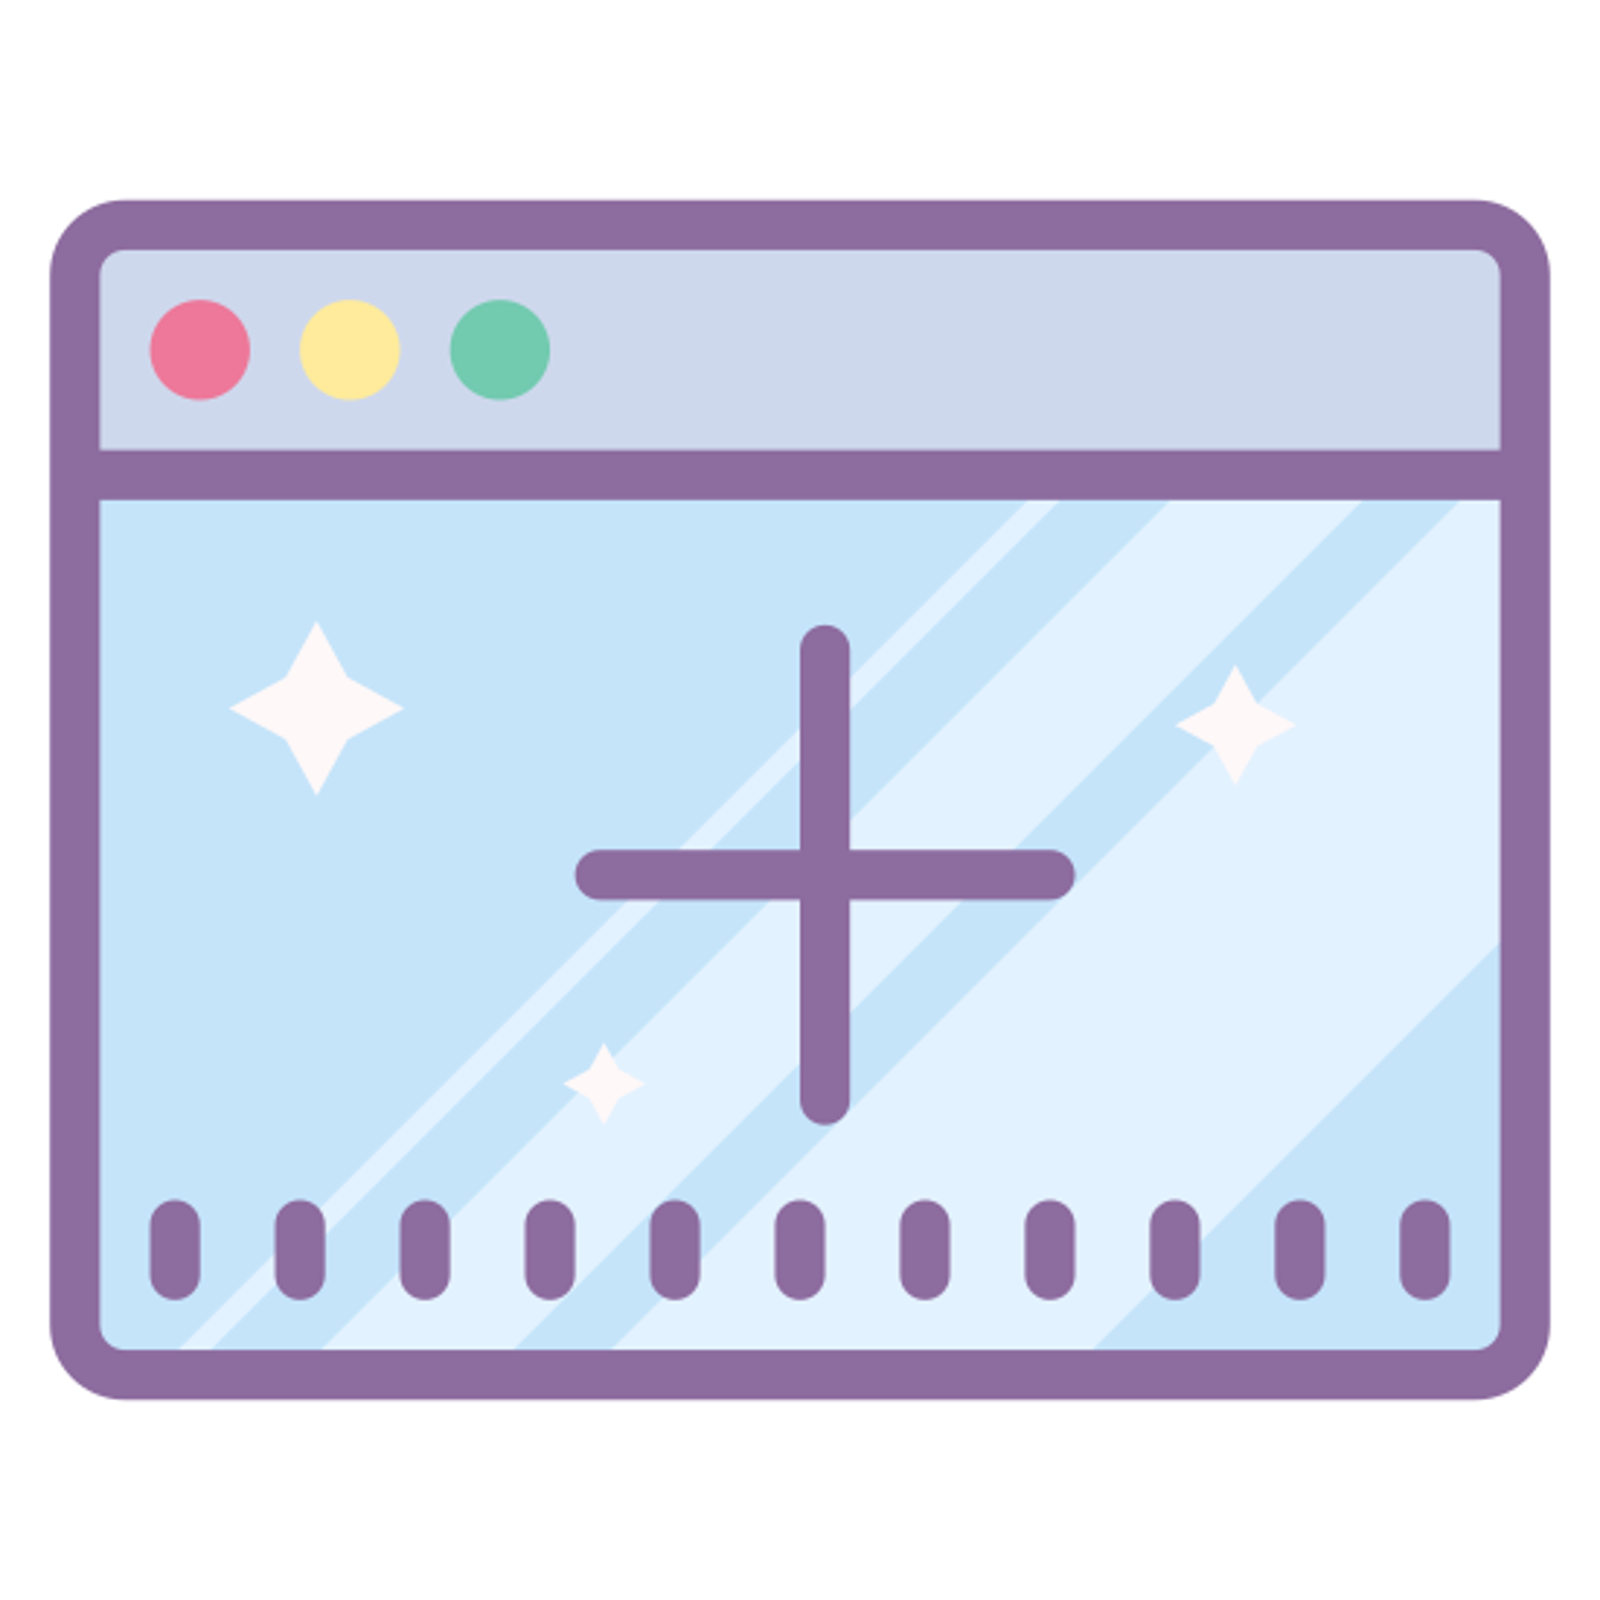 Nowe okno icon